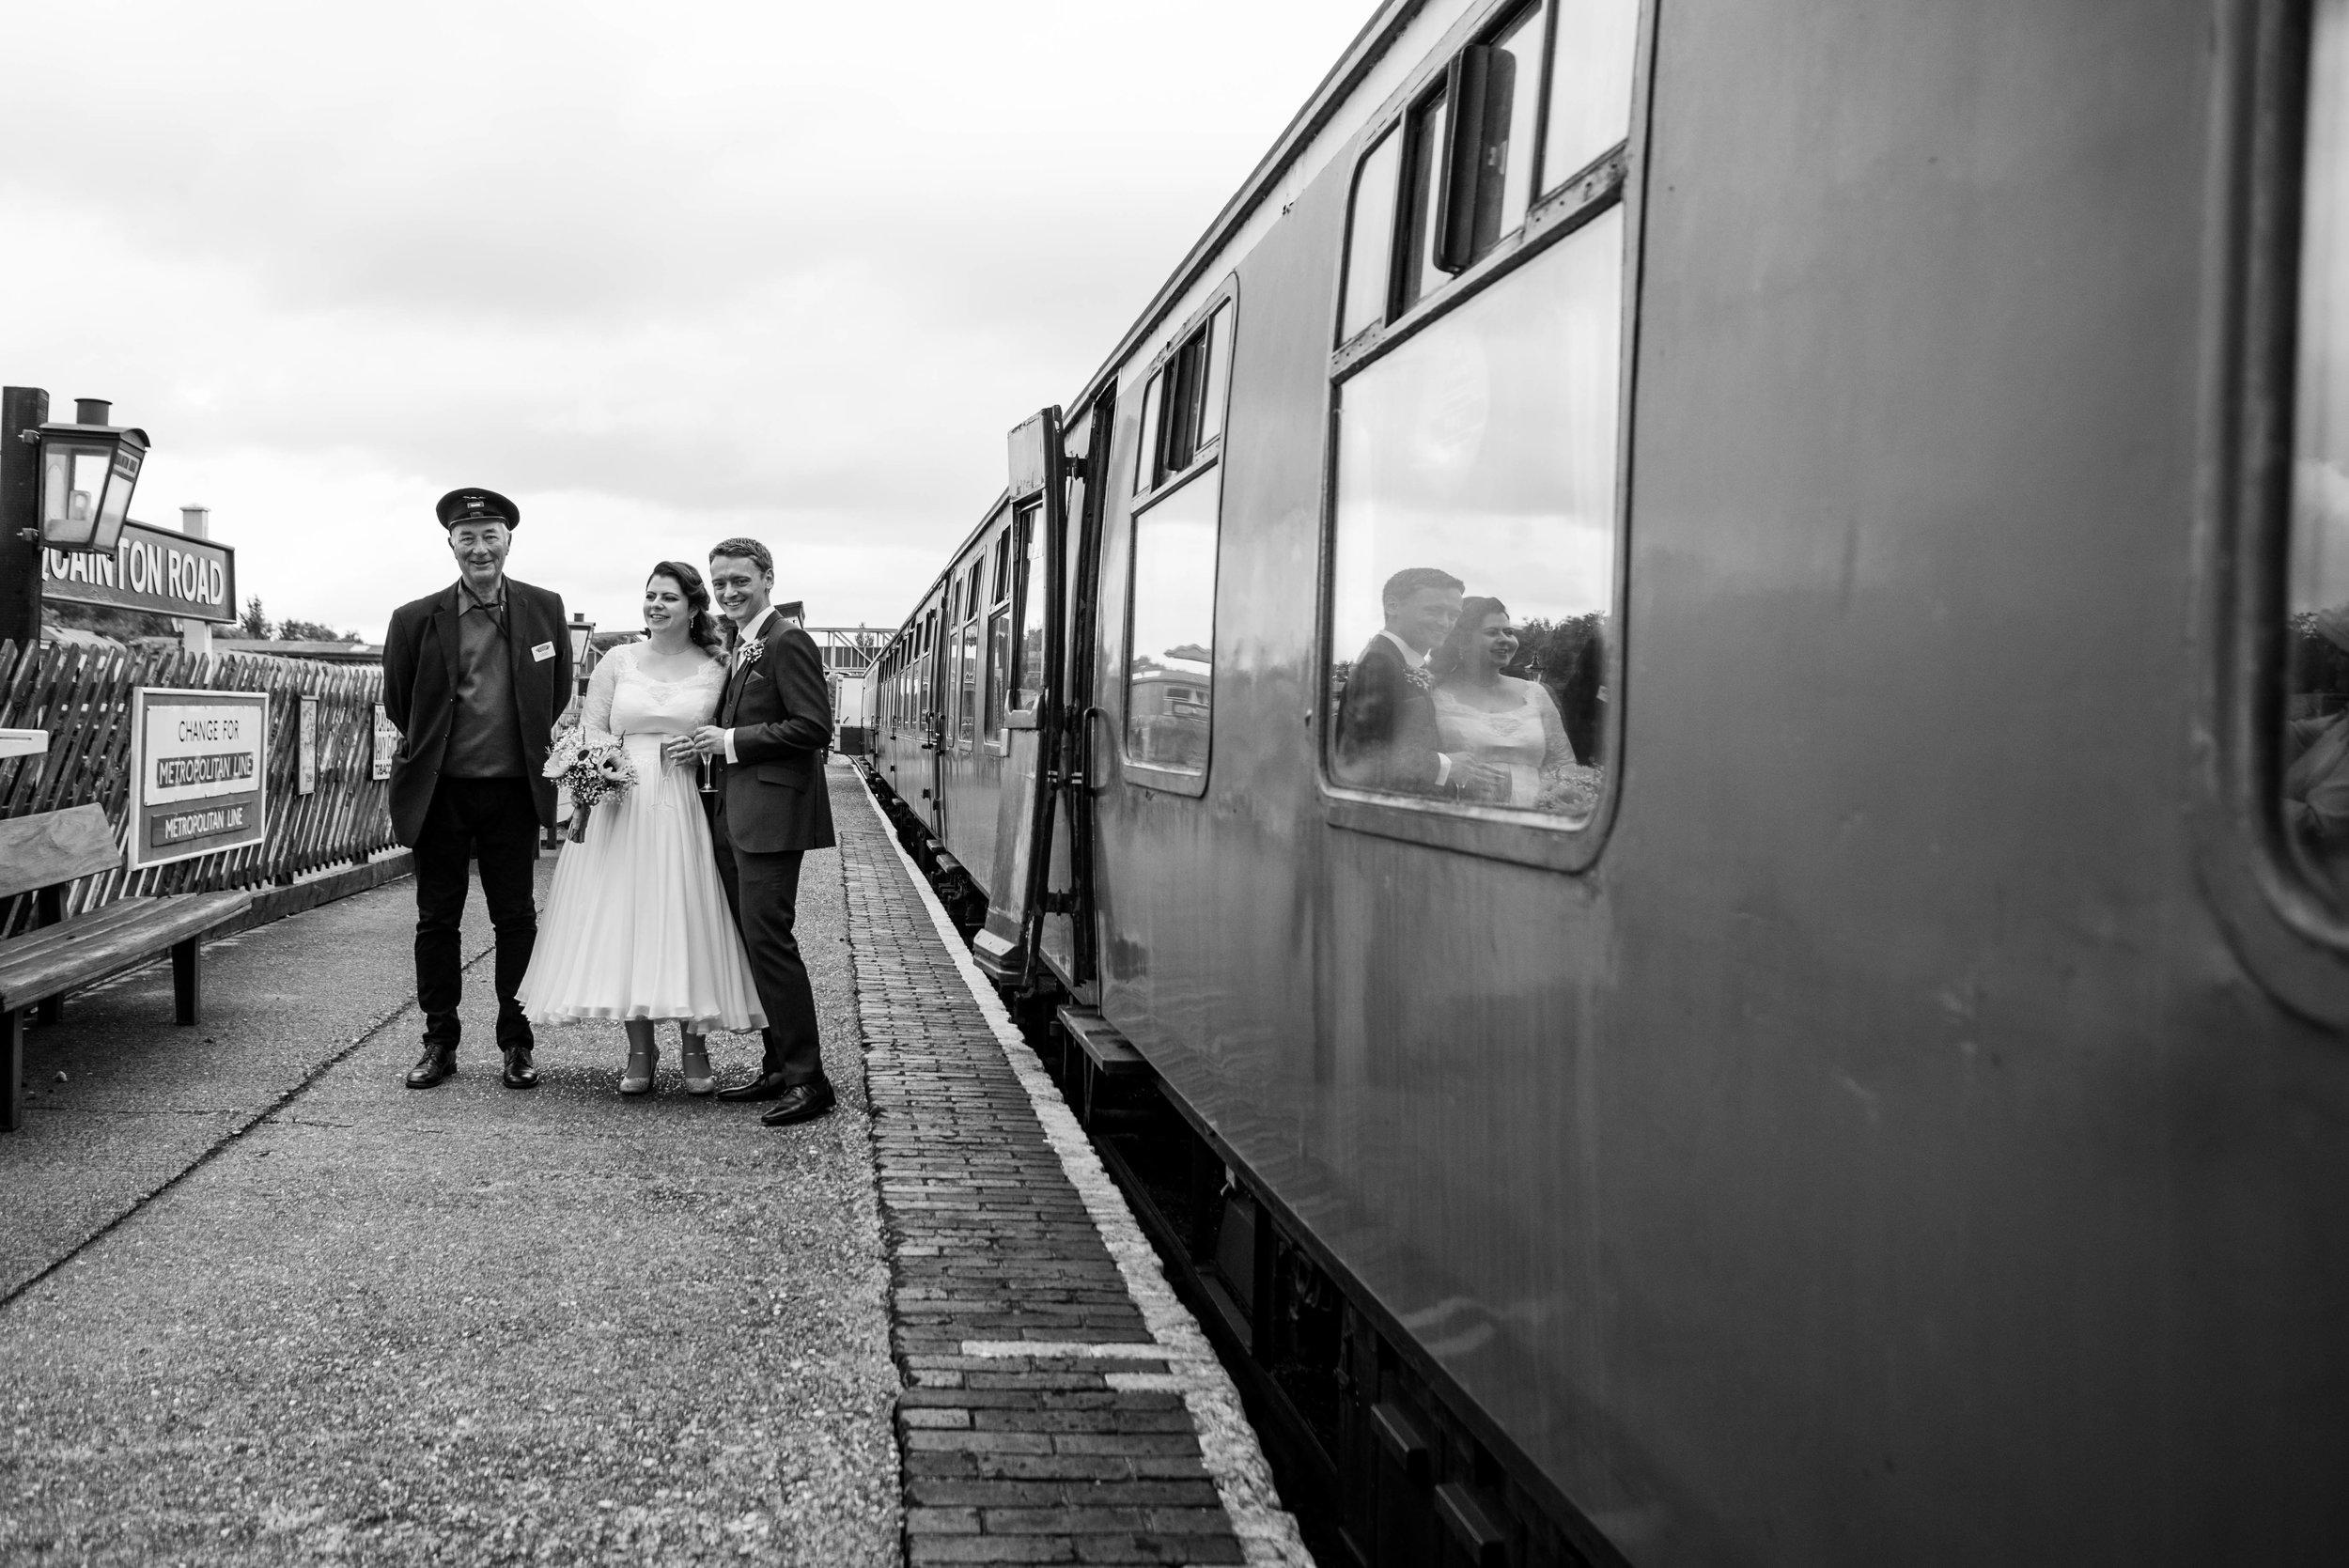 Buckinghamshire_Railway_Museum_Nick_Labrum_Photo_Emily&Marcus_blacknwhite-282.jpg